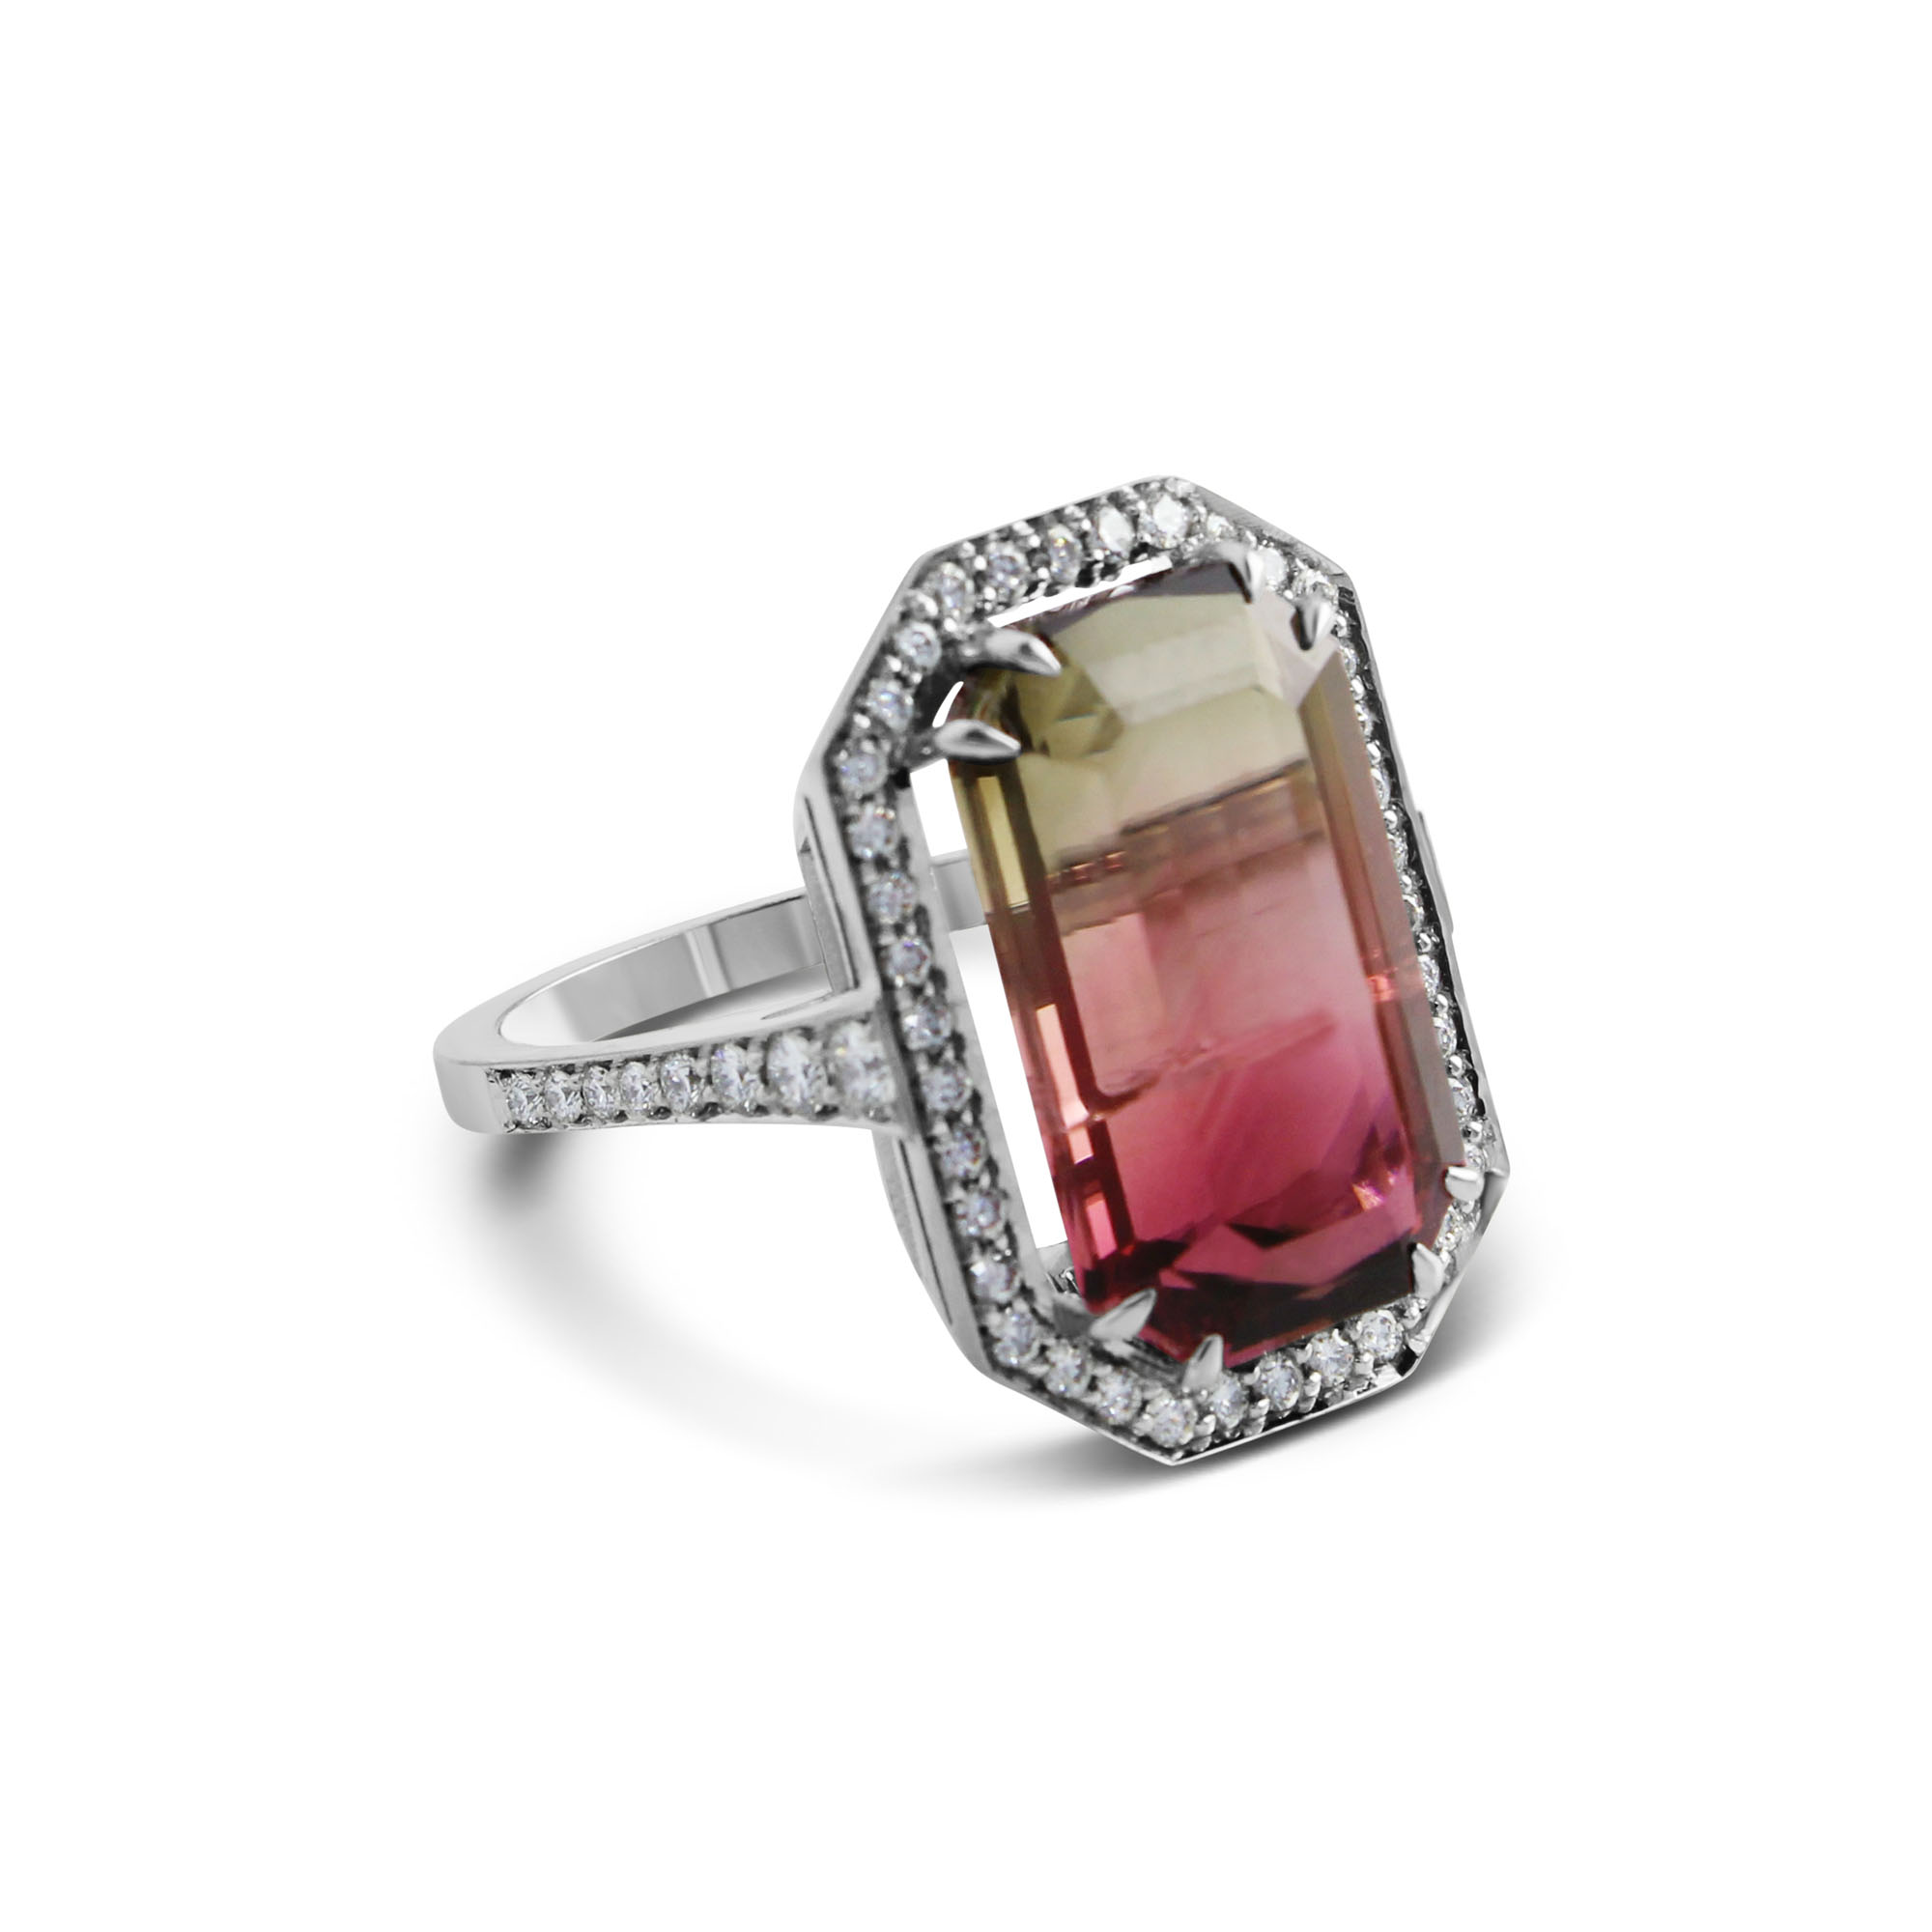 cad-man-jewellery-watermelon-ring.jpg